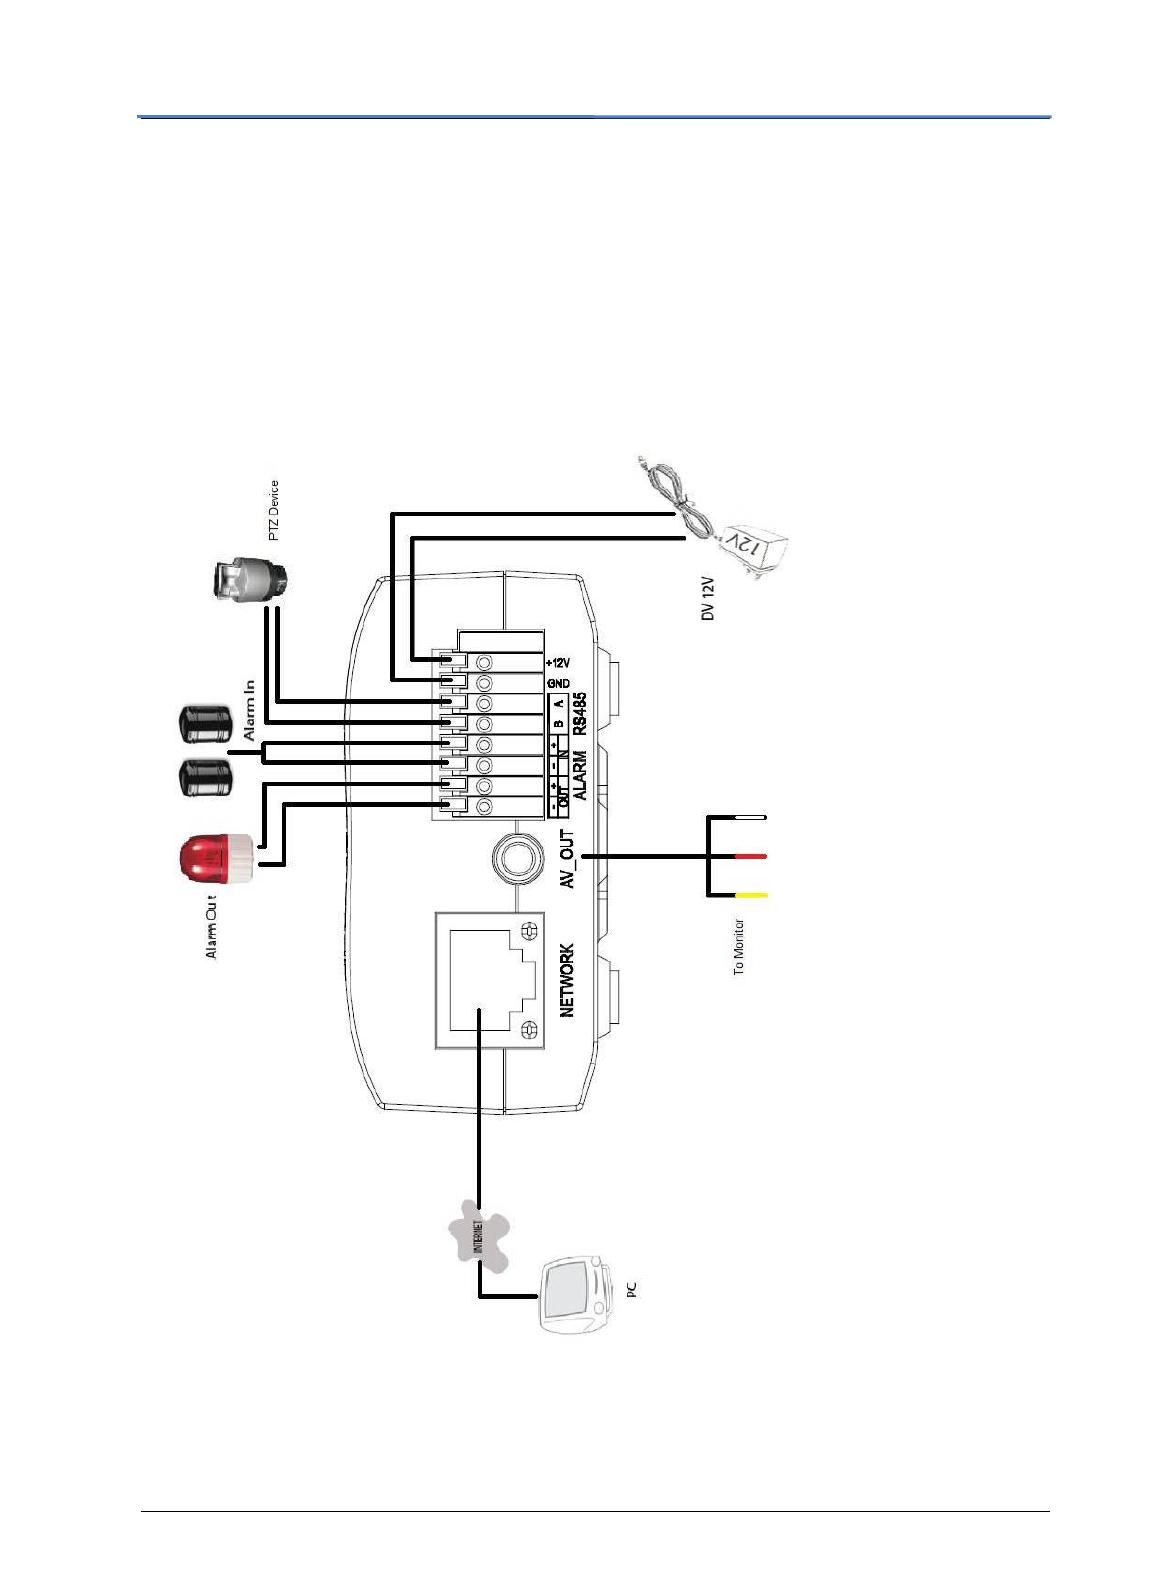 Grandstream Networks GXV3500 IP Video Codec User Manual